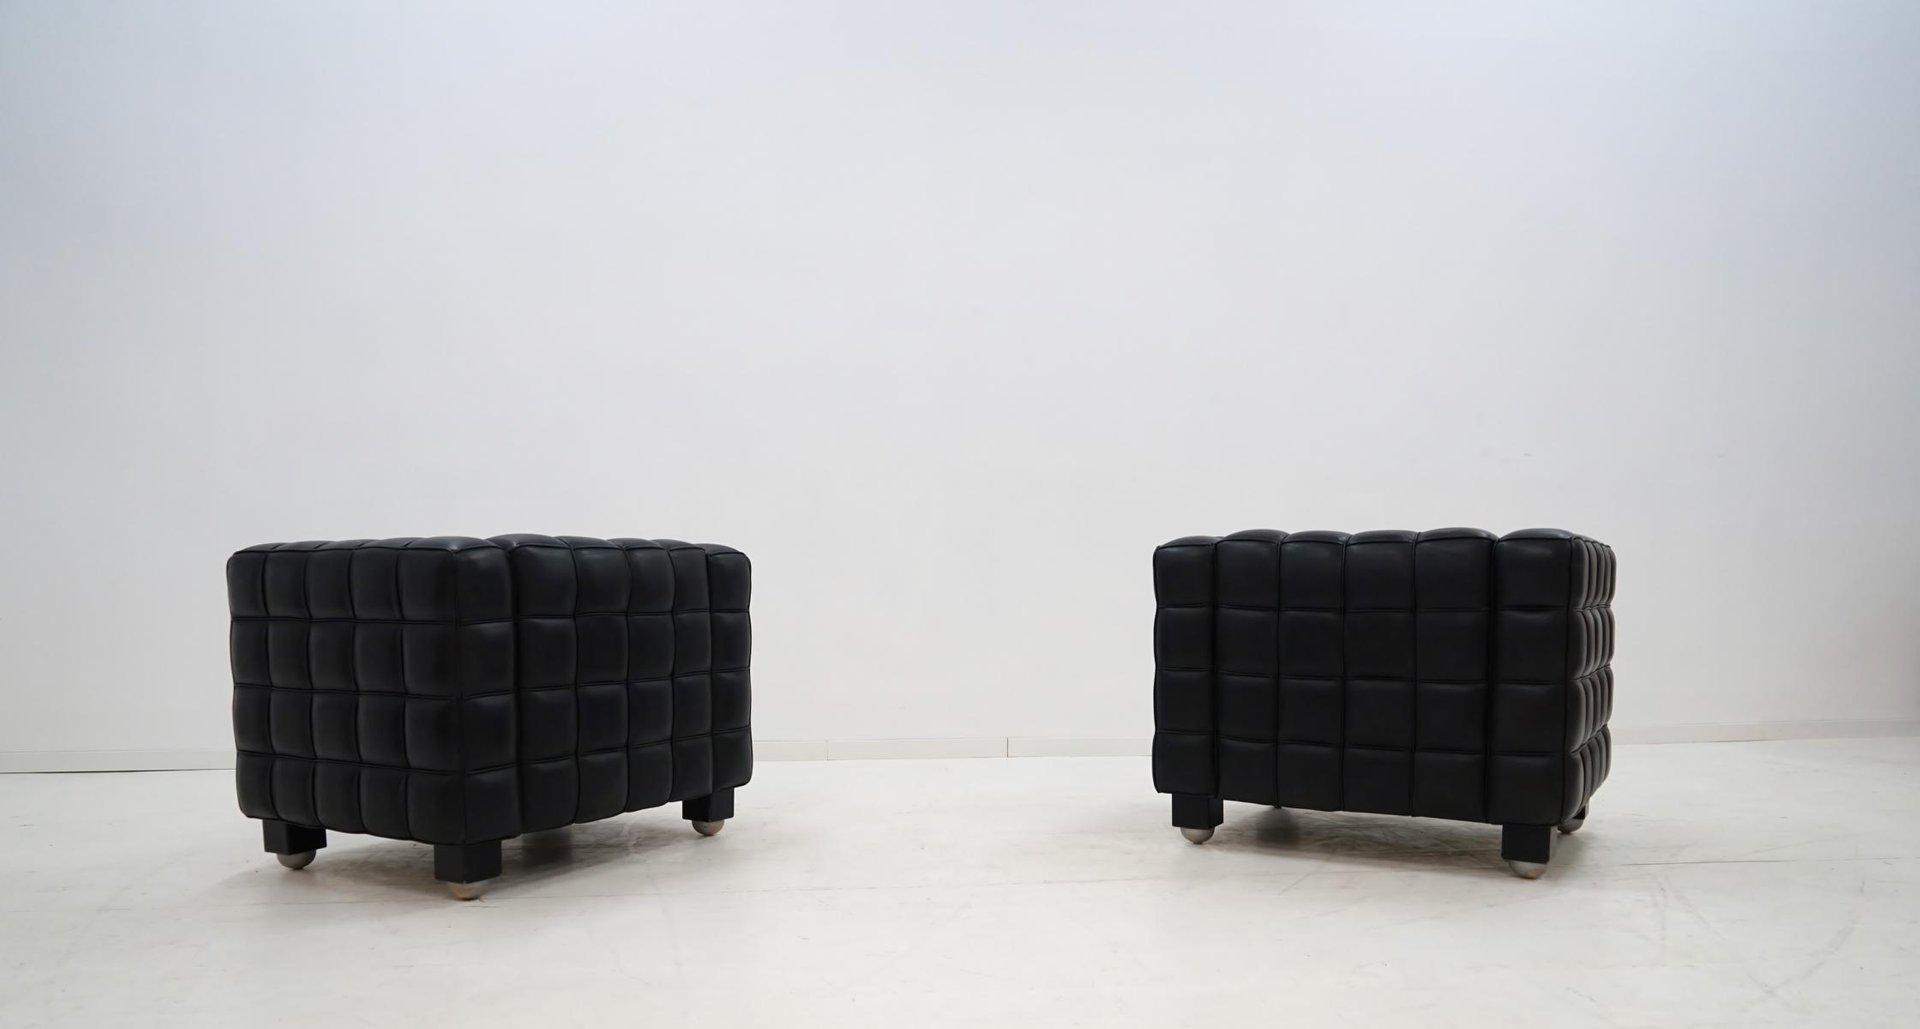 kubus sessel von josef hoffmann f r wittmann 1970er bei. Black Bedroom Furniture Sets. Home Design Ideas